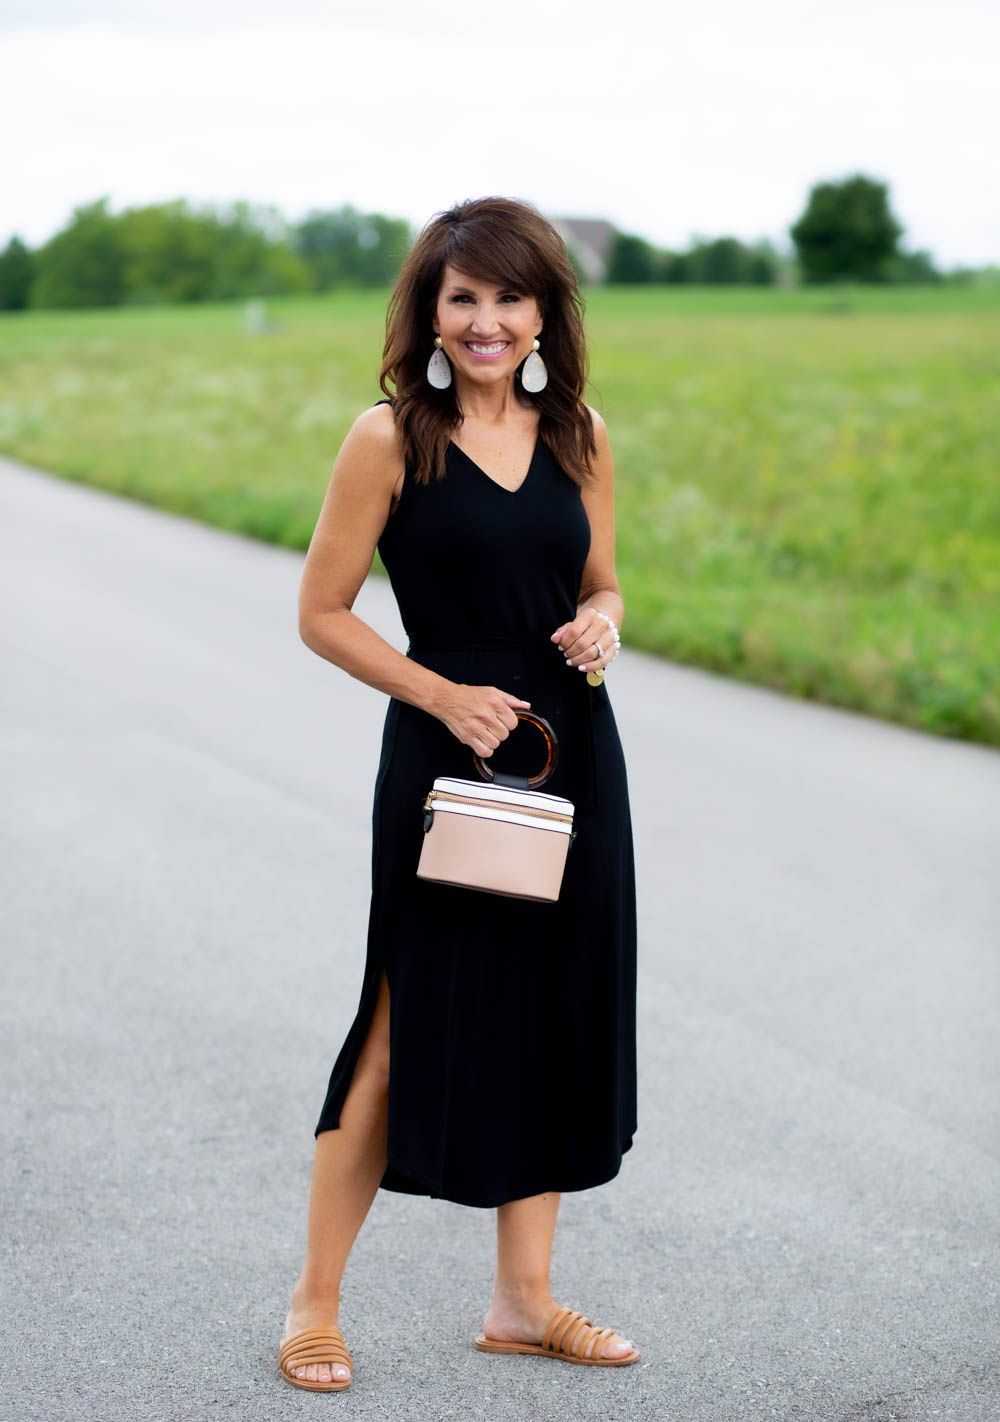 V Neck Maxi Dress From Target Cyndi Spivey Fashion Cyndi Spivey Summer Outfits Women Over 40 [ 1422 x 1000 Pixel ]